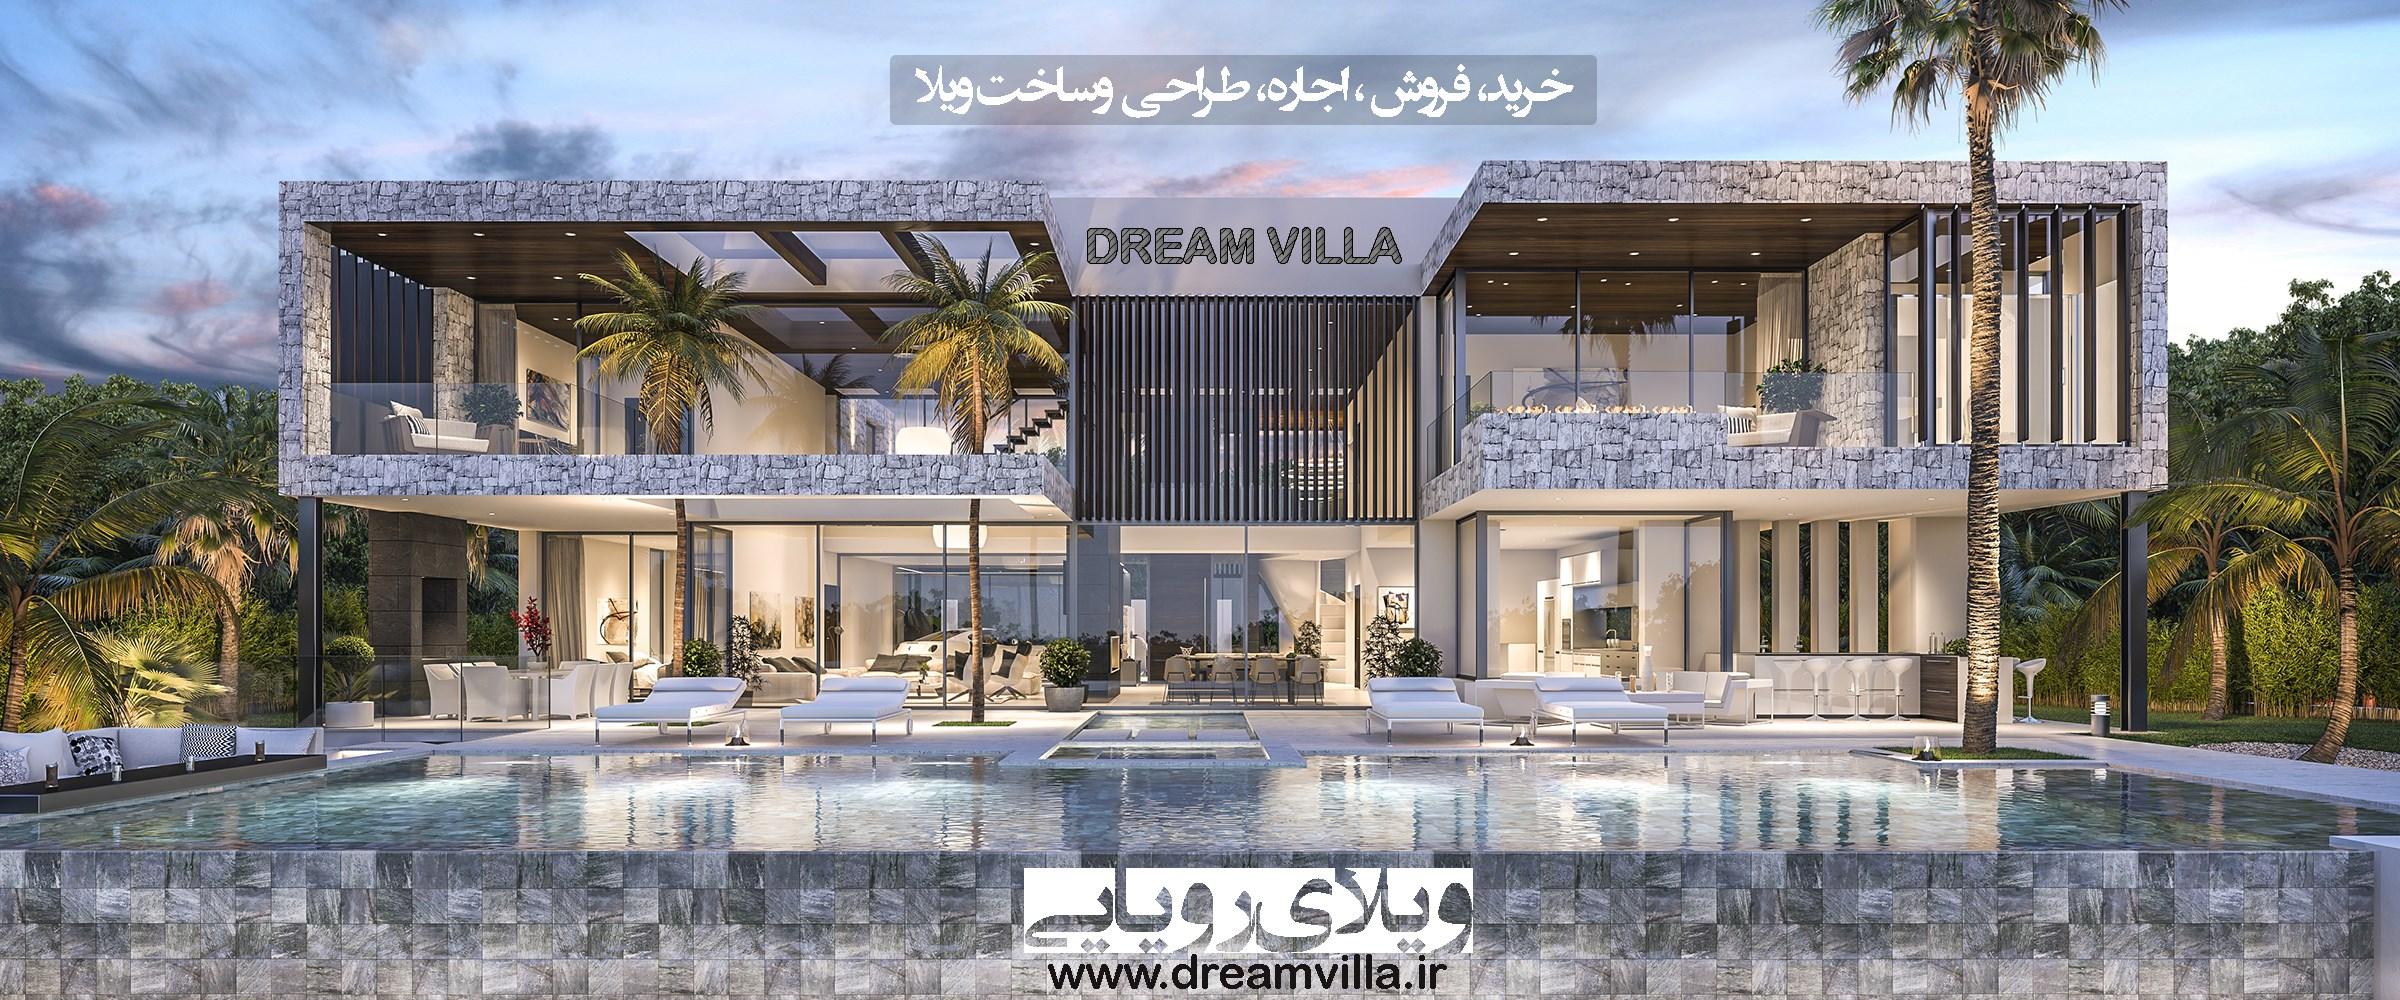 دریم ویلا ( ویلای رویایی ) | Dream Villa